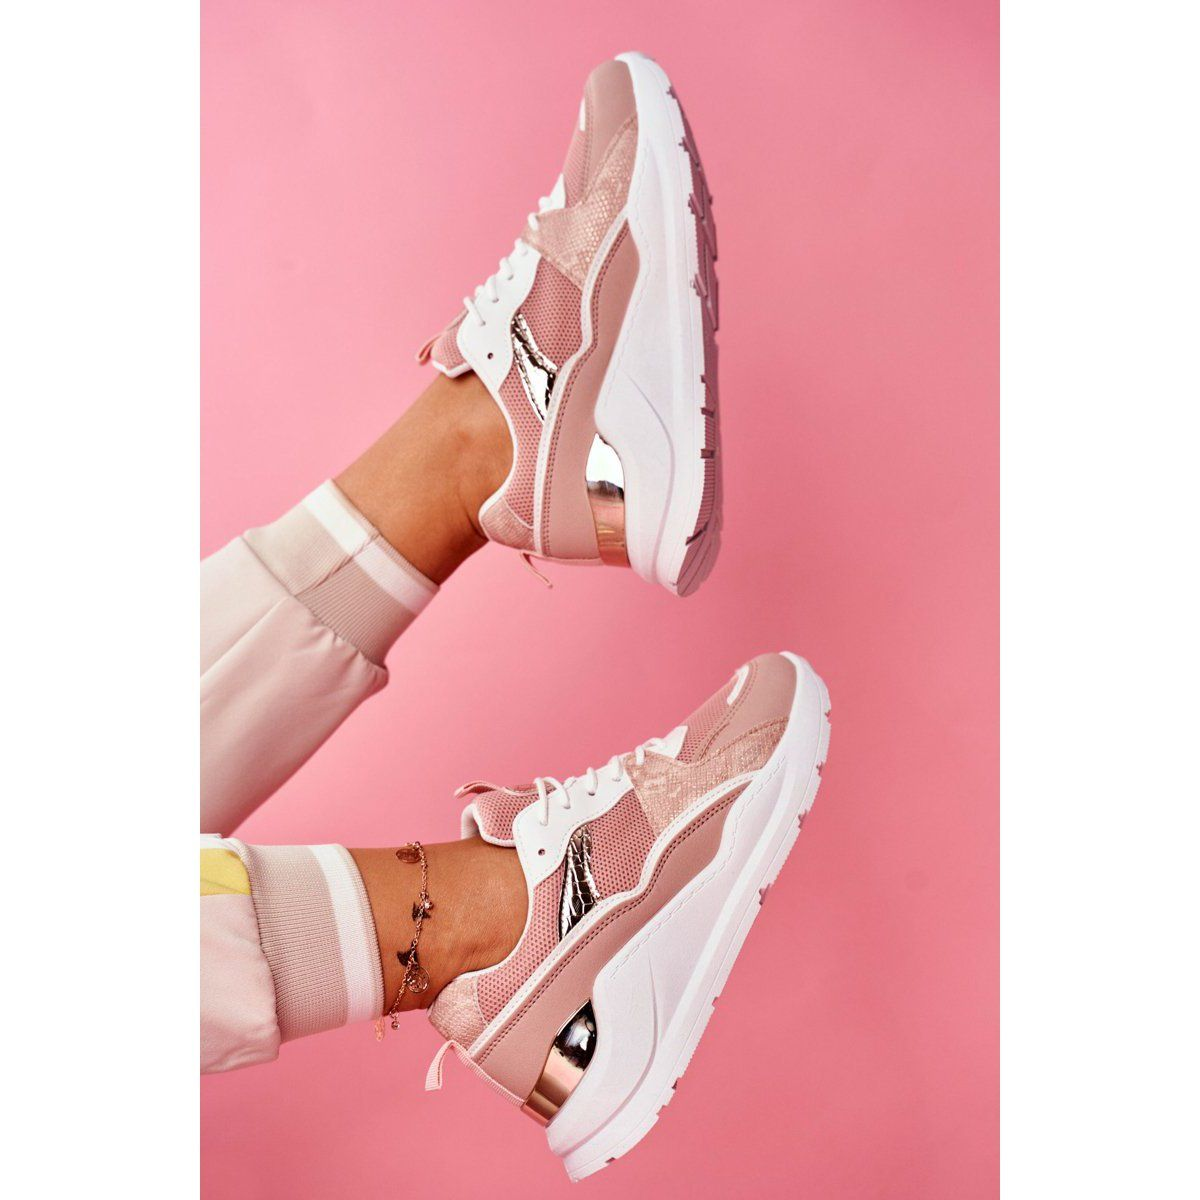 Sea Sportowe Damskie Buty Sneakersy Bialo Rozowe Martina Biale Sneakers Nike Nike Huarache Shoes